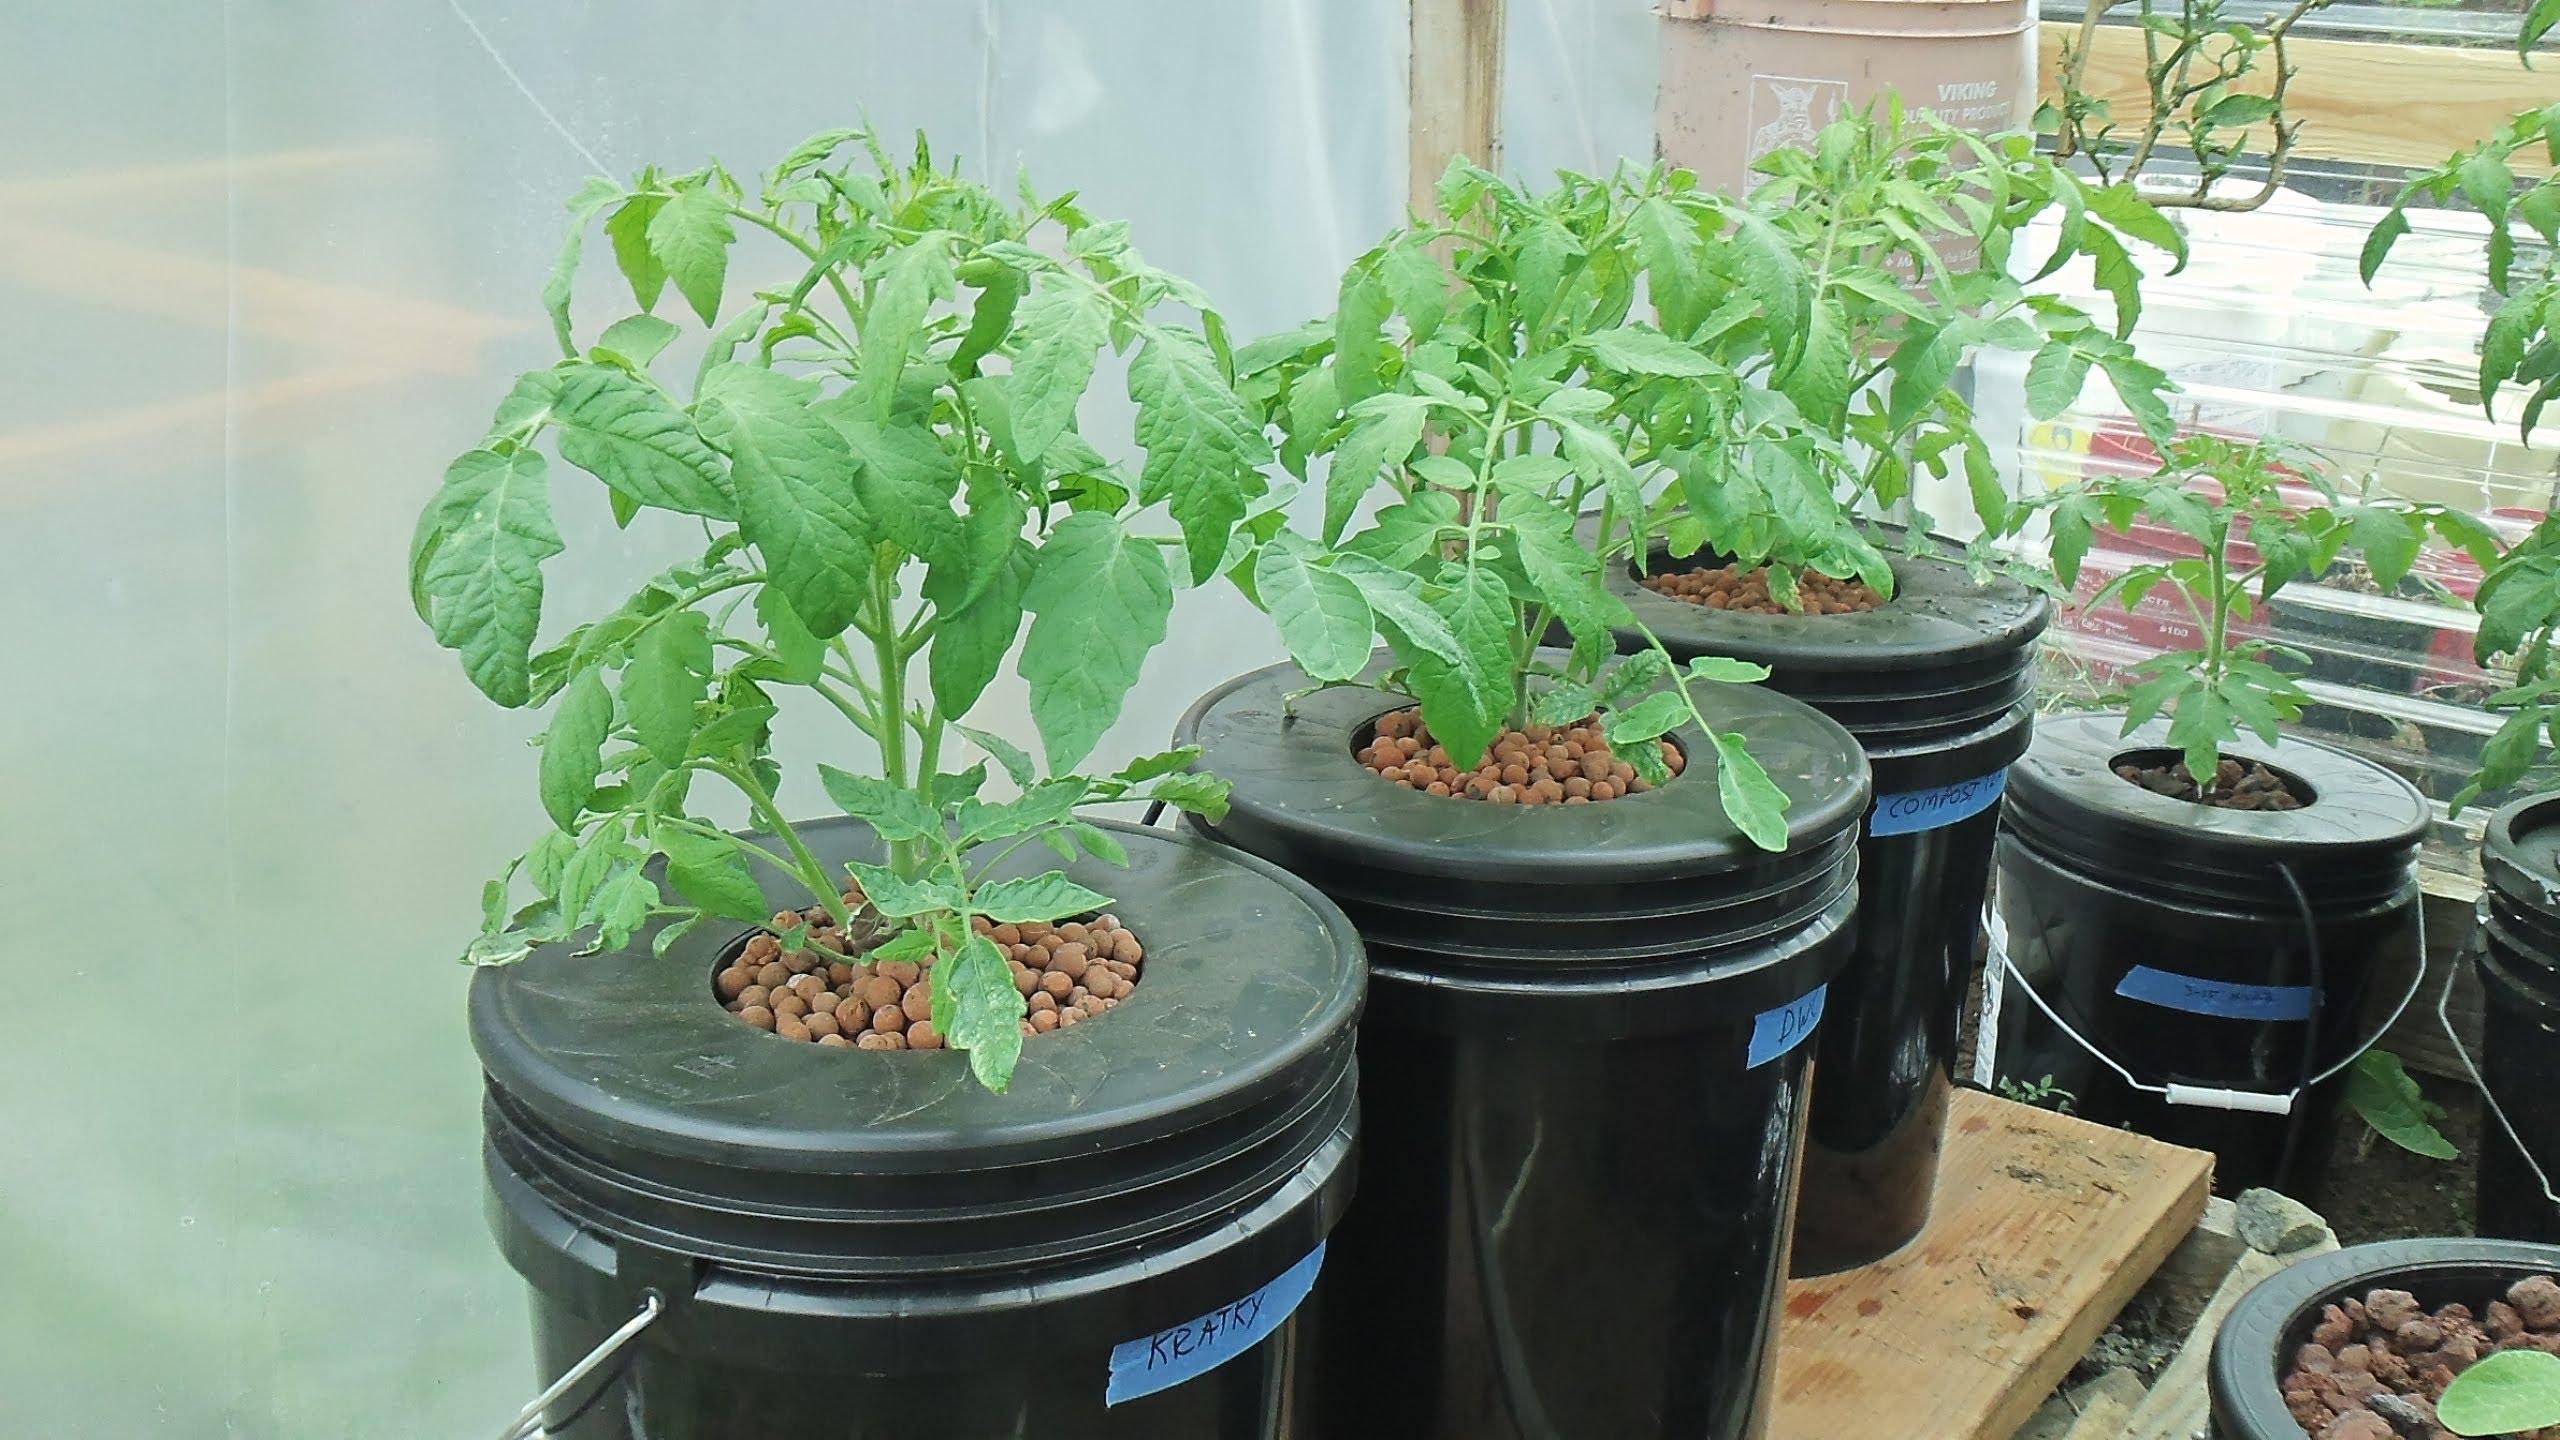 Kratky Method-DWC-Compost Tea Hydroponics #2 Hydroponic Tomatoes